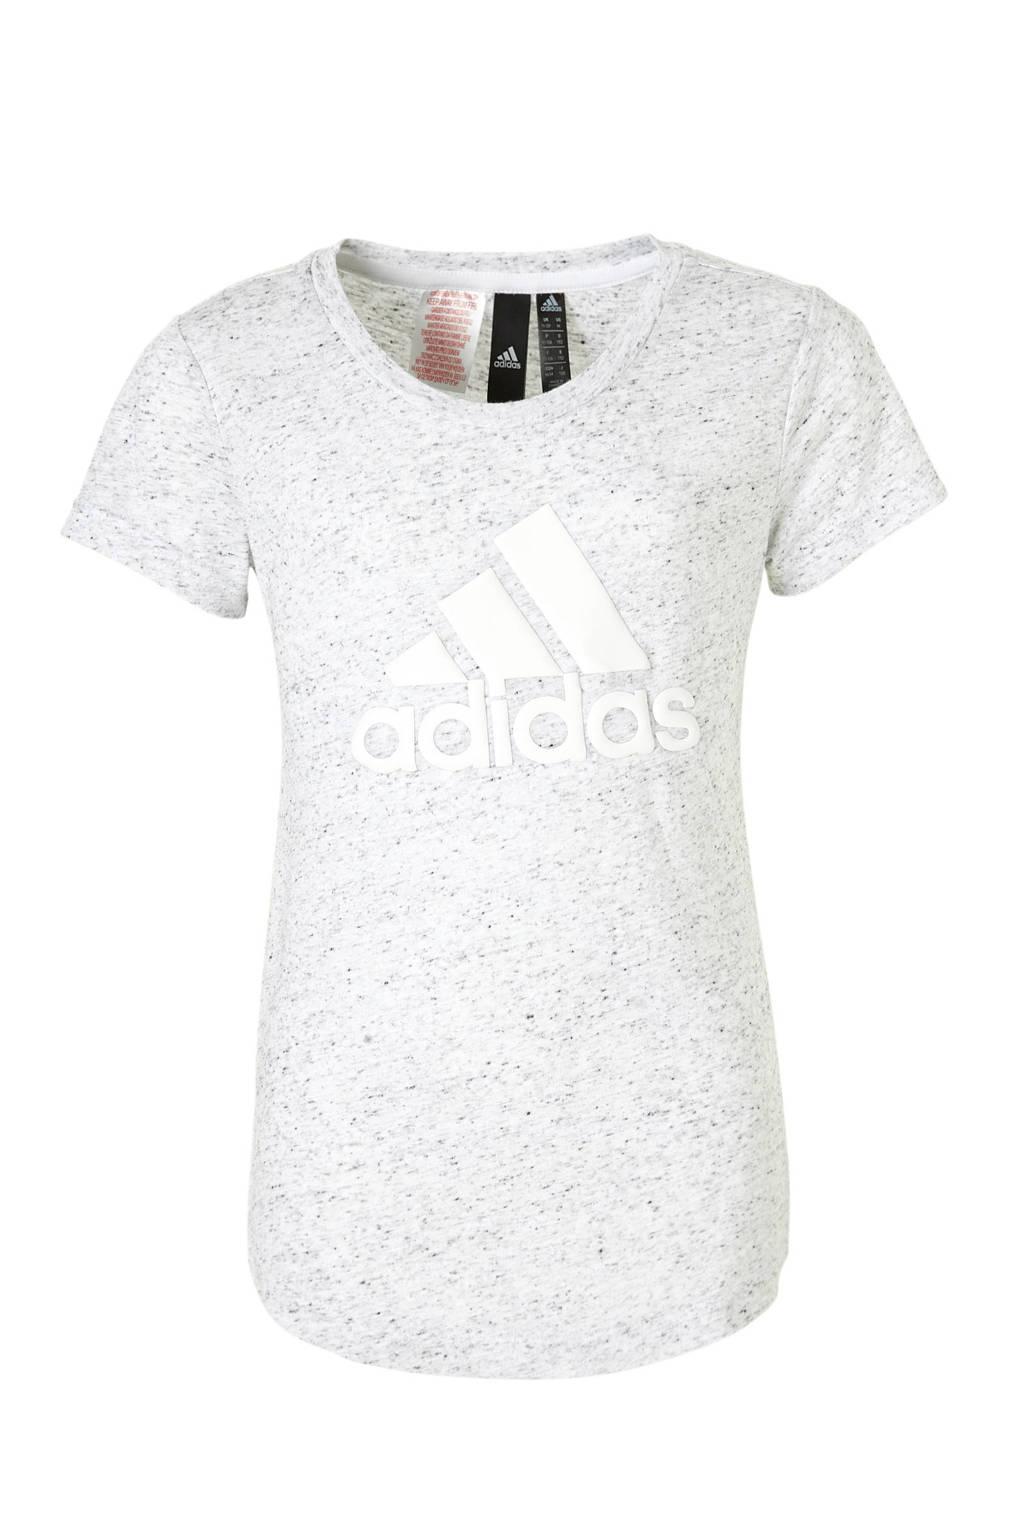 adidas performance sport T-shirt lichtgrijs, Lichtgrijs